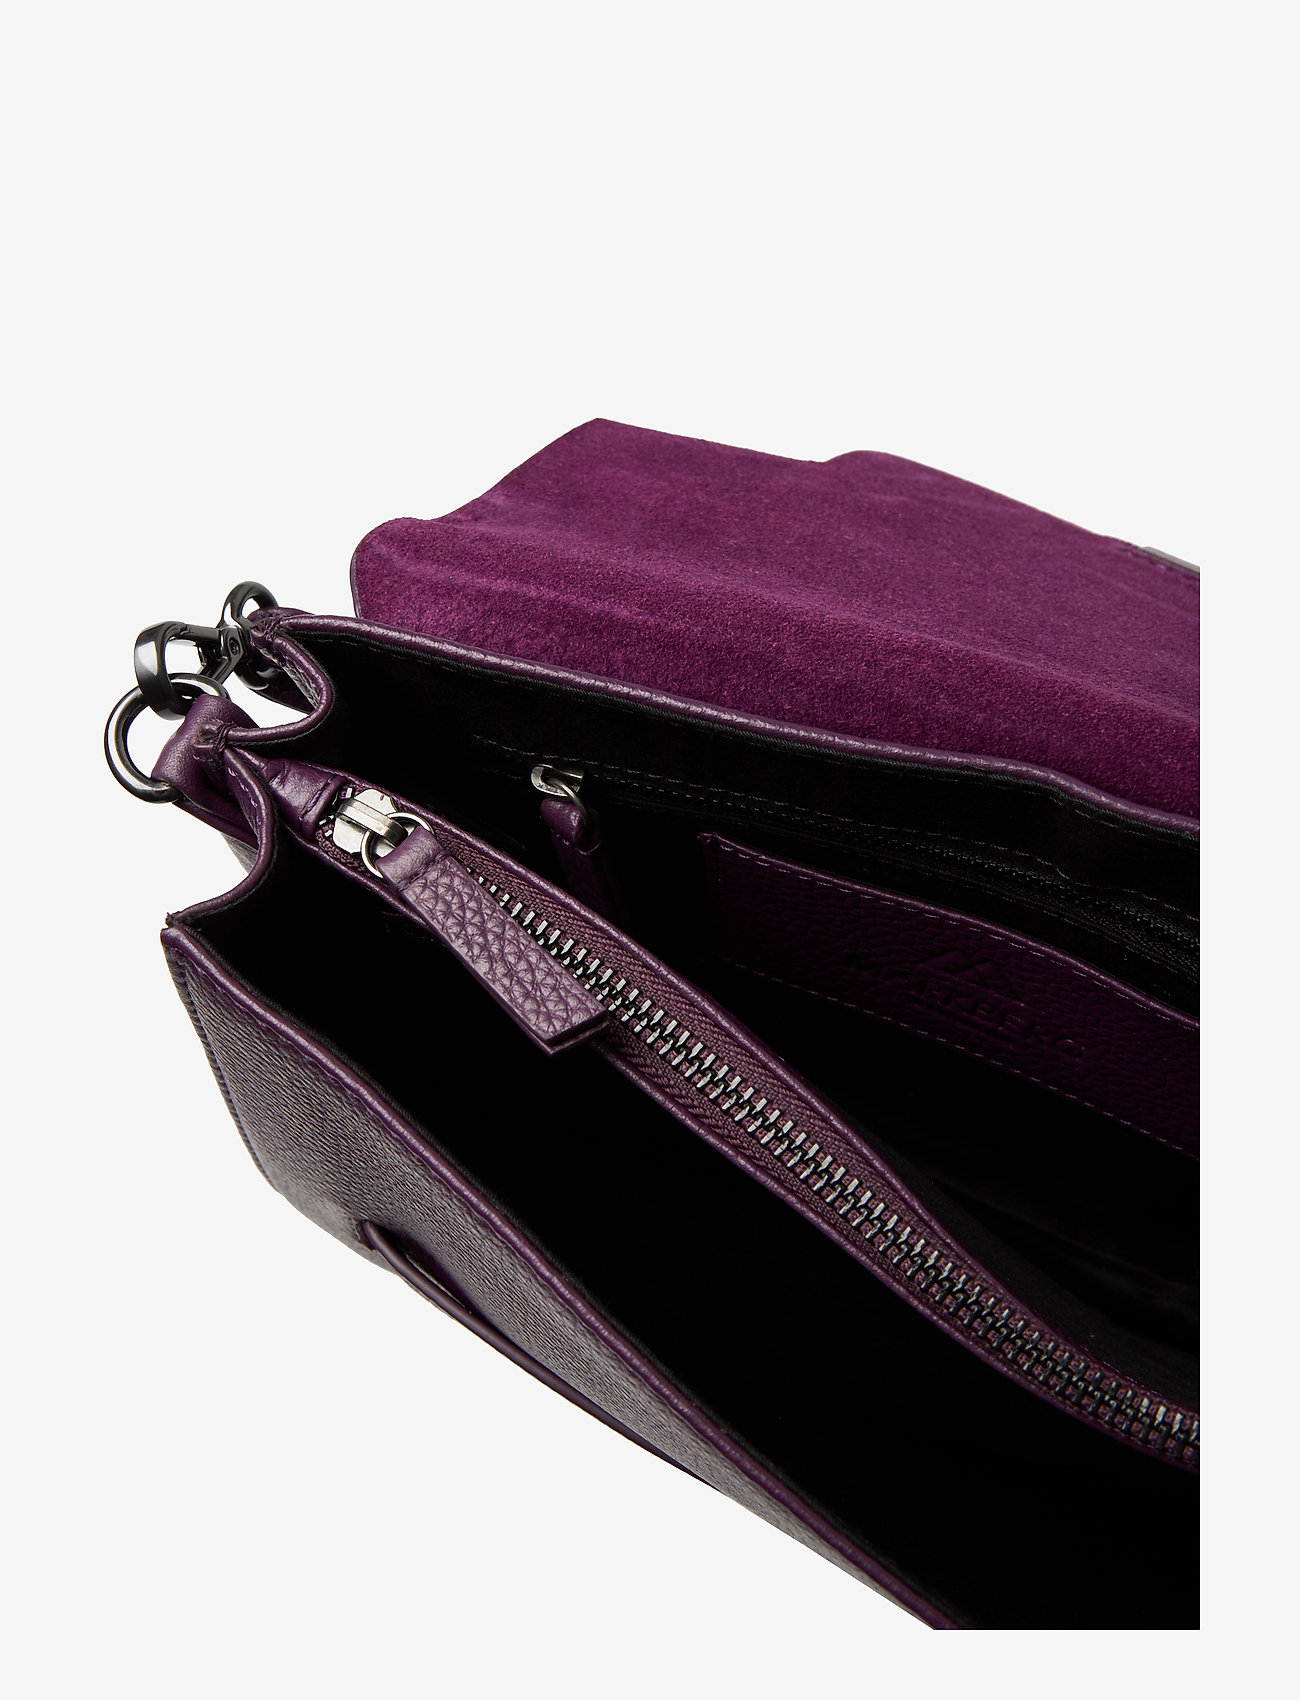 Markberg Arabella Crossbody Bag, Sue. M - Portés Travers D. Purp W/bl+gl+sl+purp